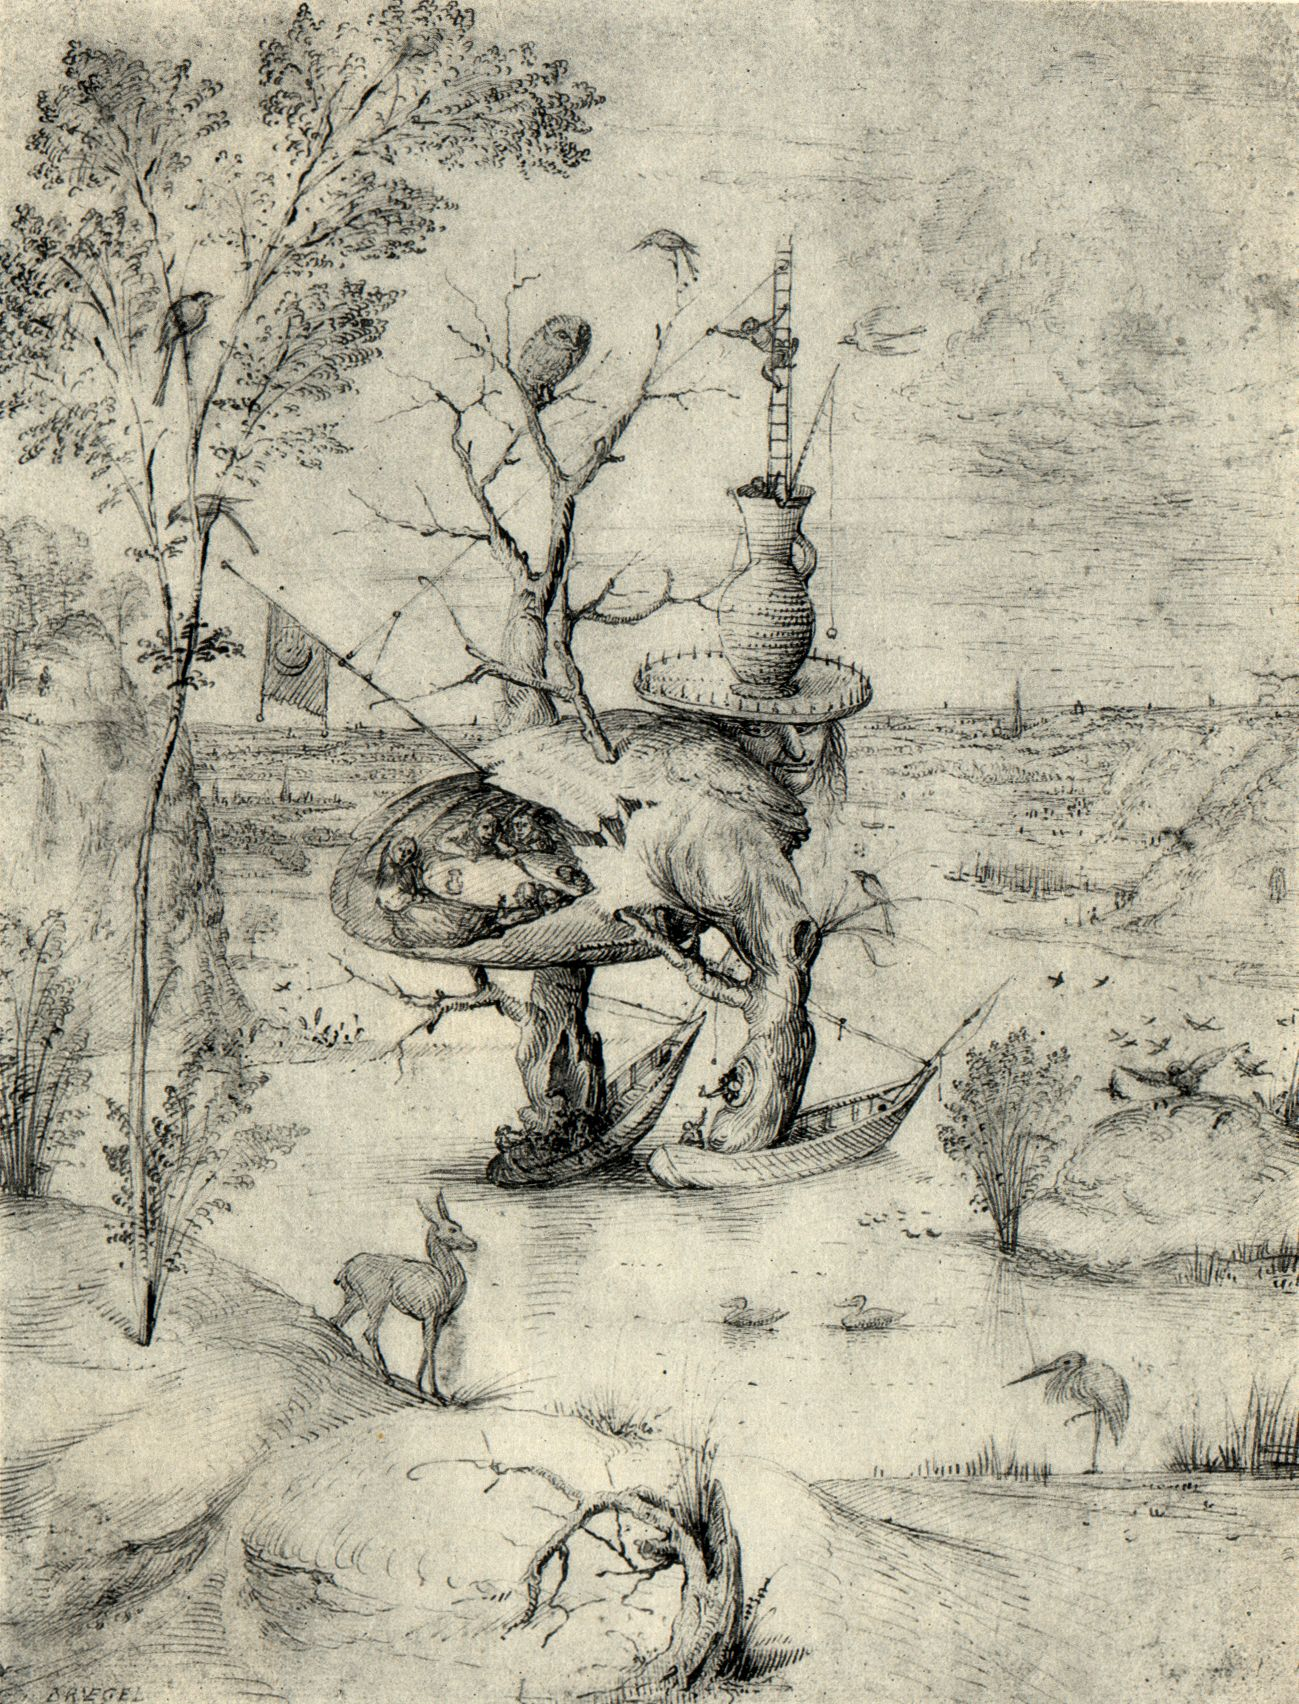 Bosch, The Man-Tree (1470)